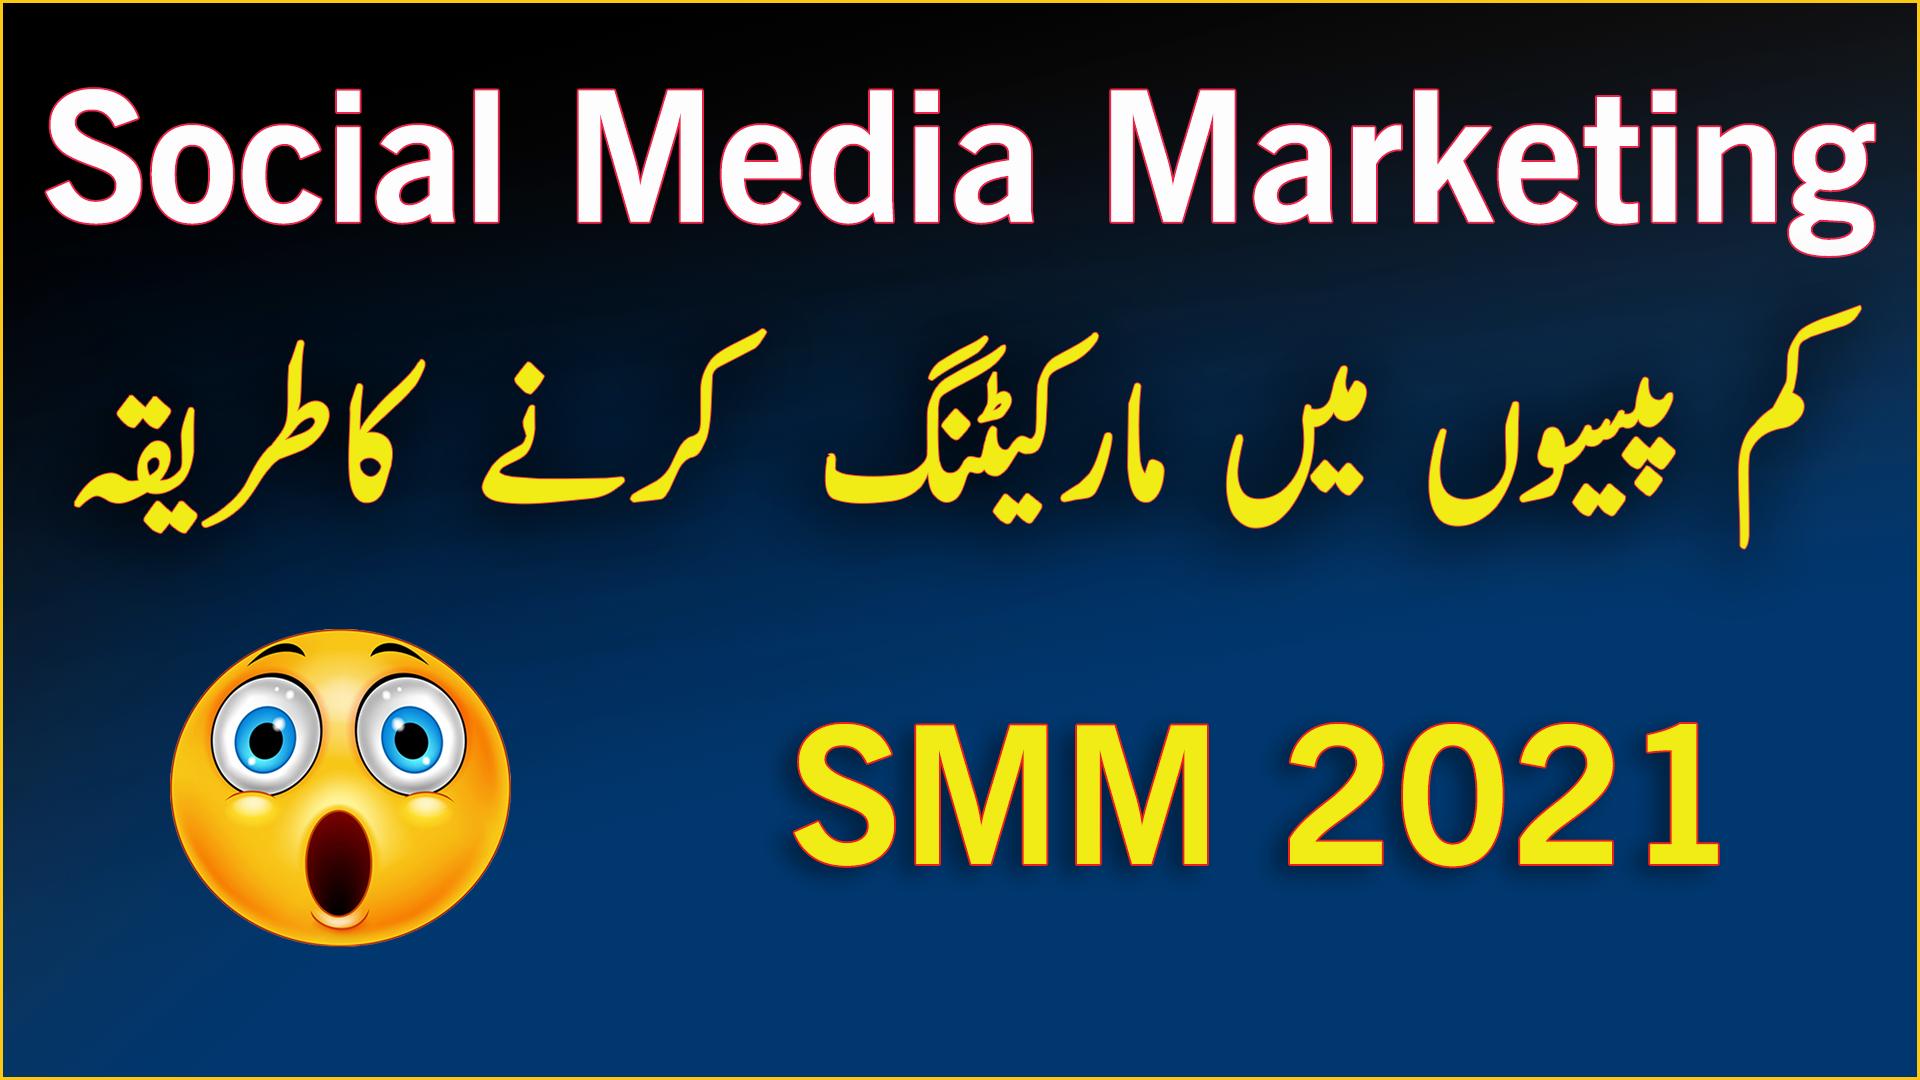 Social Media Marketing Course 2021 Image